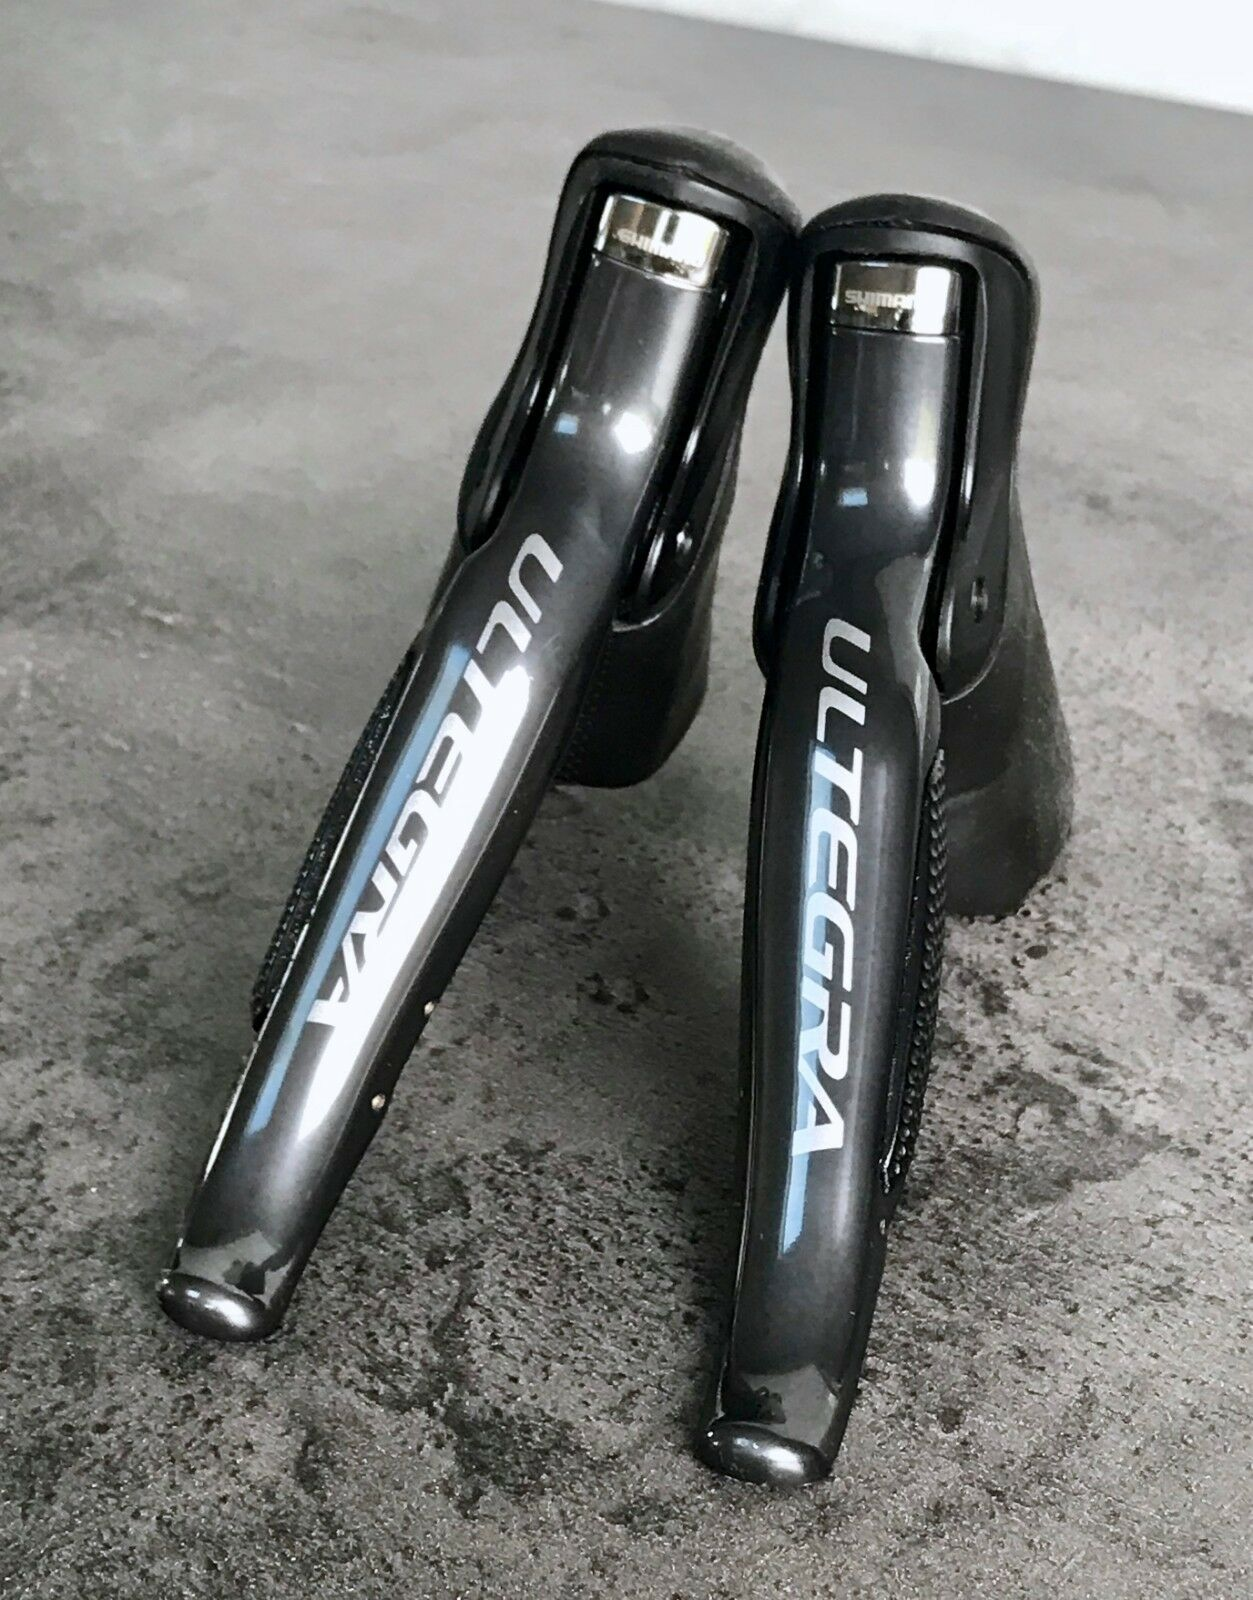 Shimano Ultegra ST-6770 Di2 Shifters 6770 Electronic Shifter Brake Levers Set